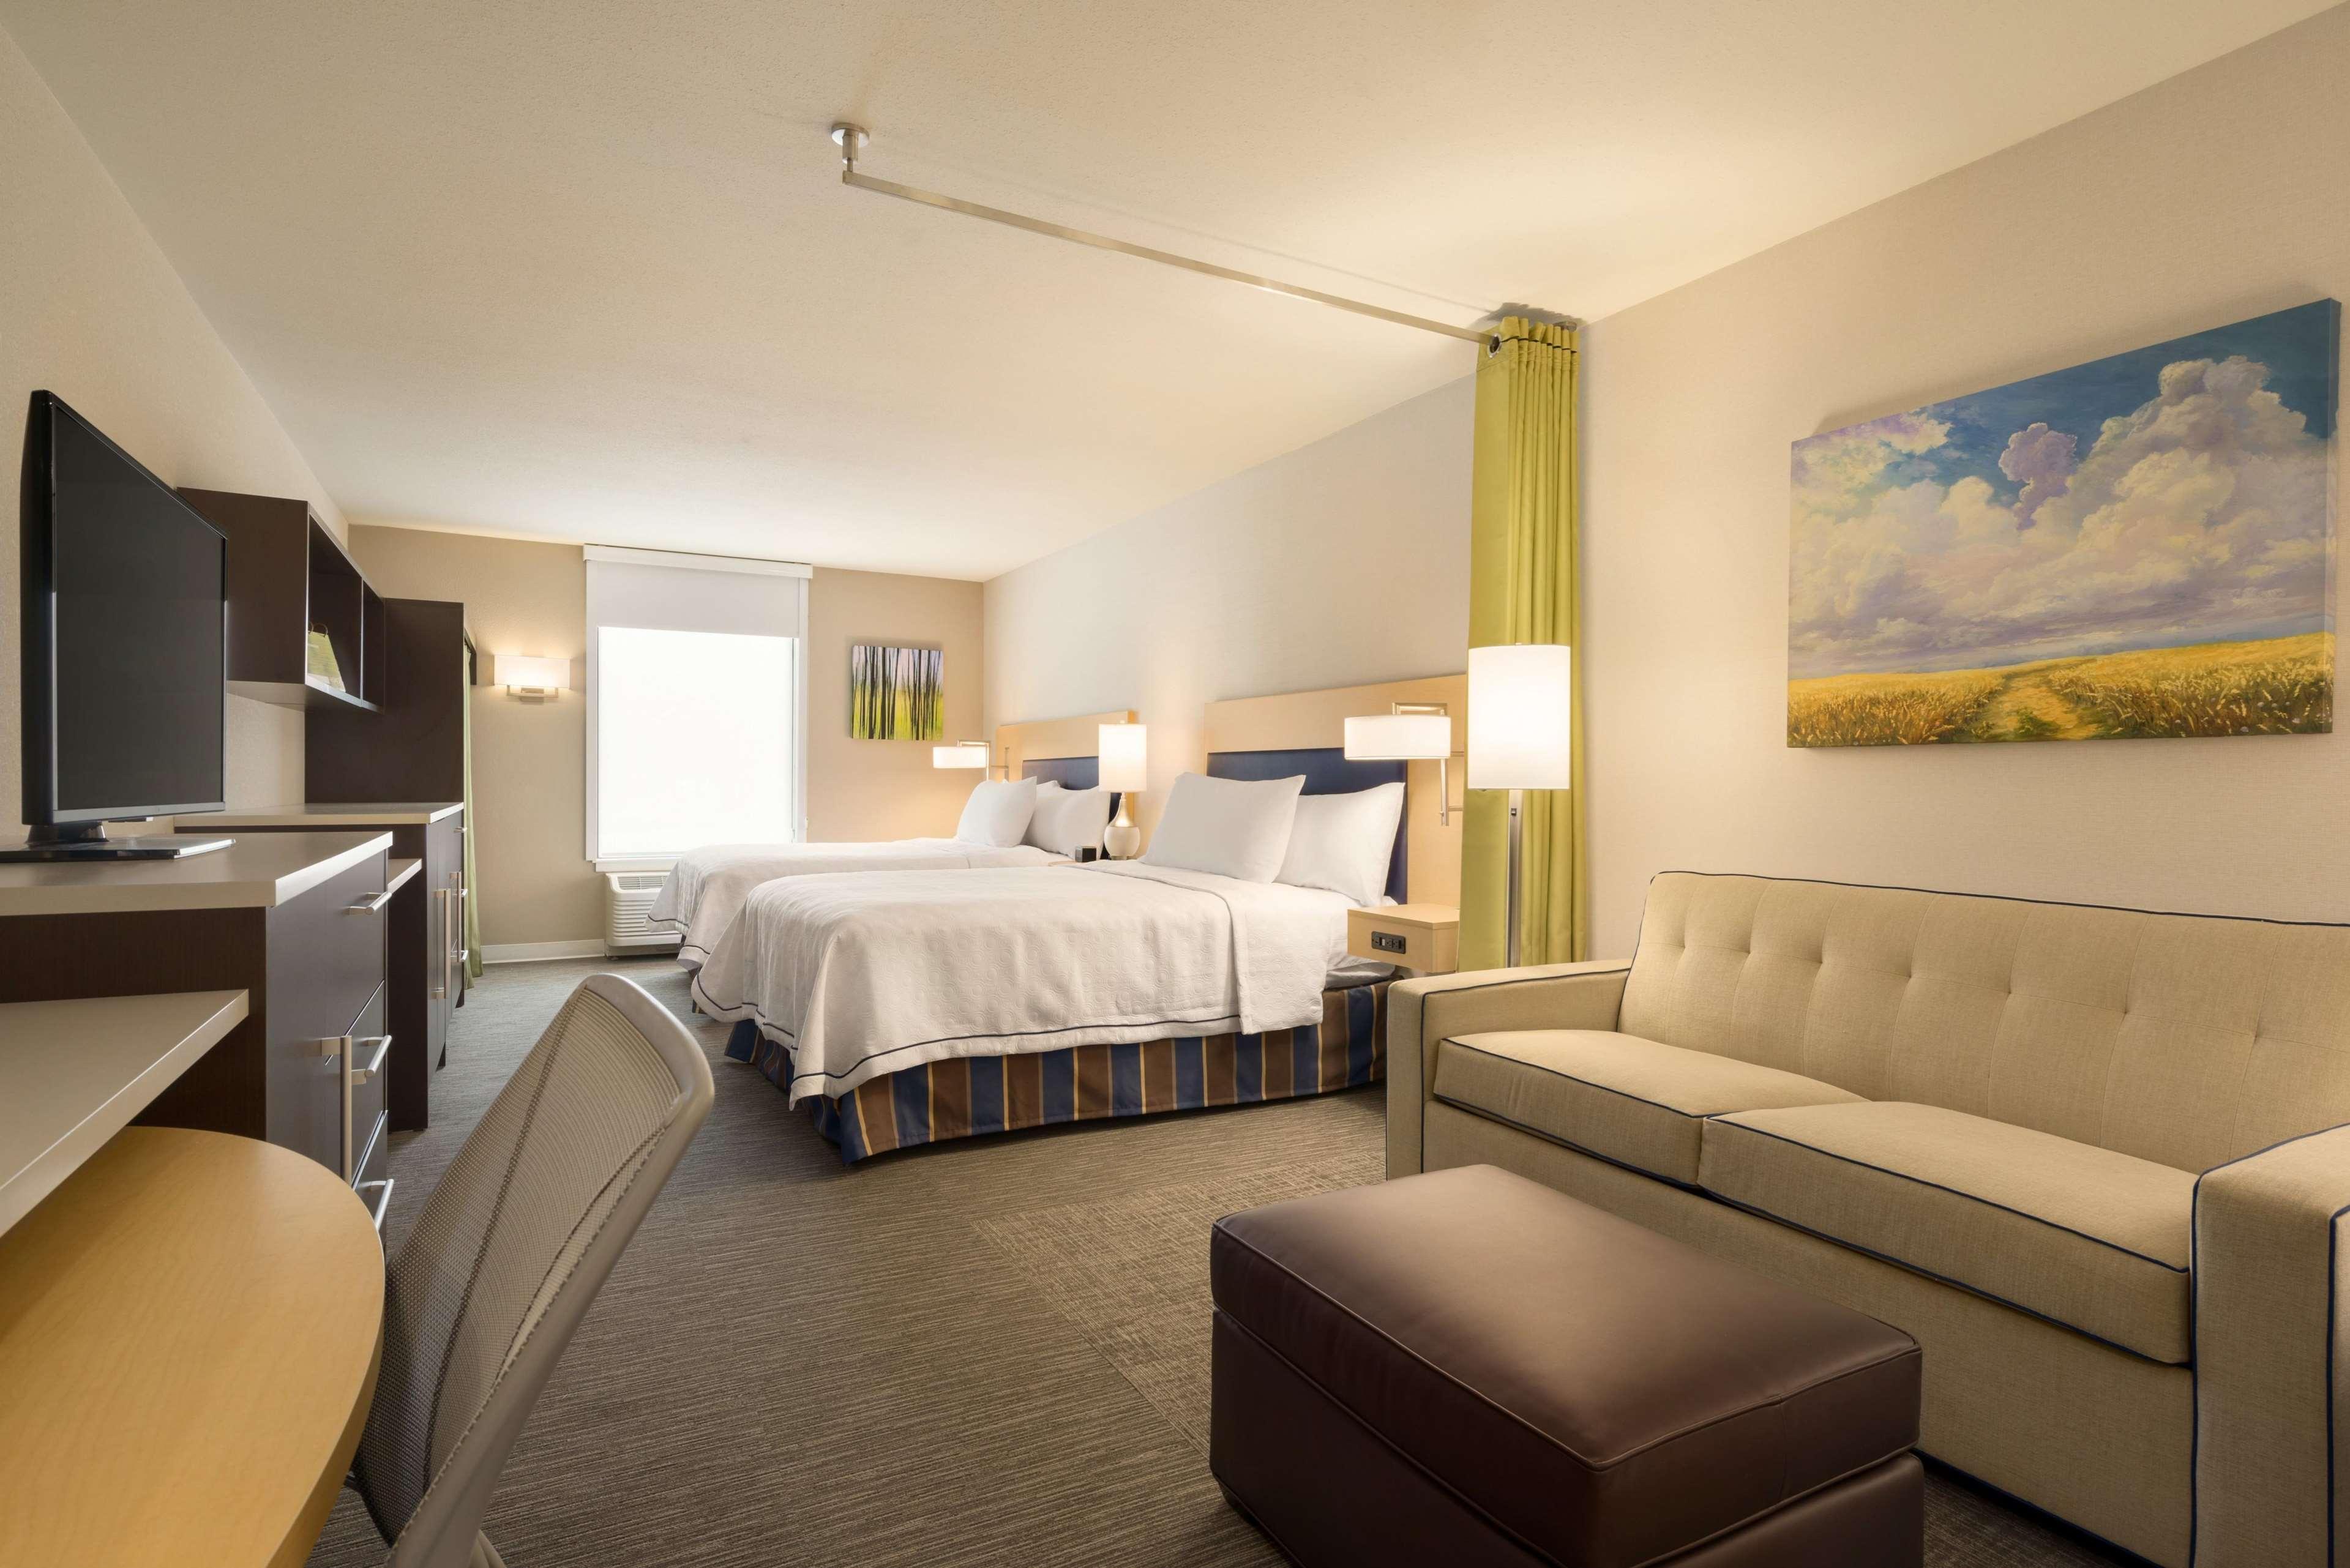 Home2 Suites by Hilton Leavenworth Downtown image 18